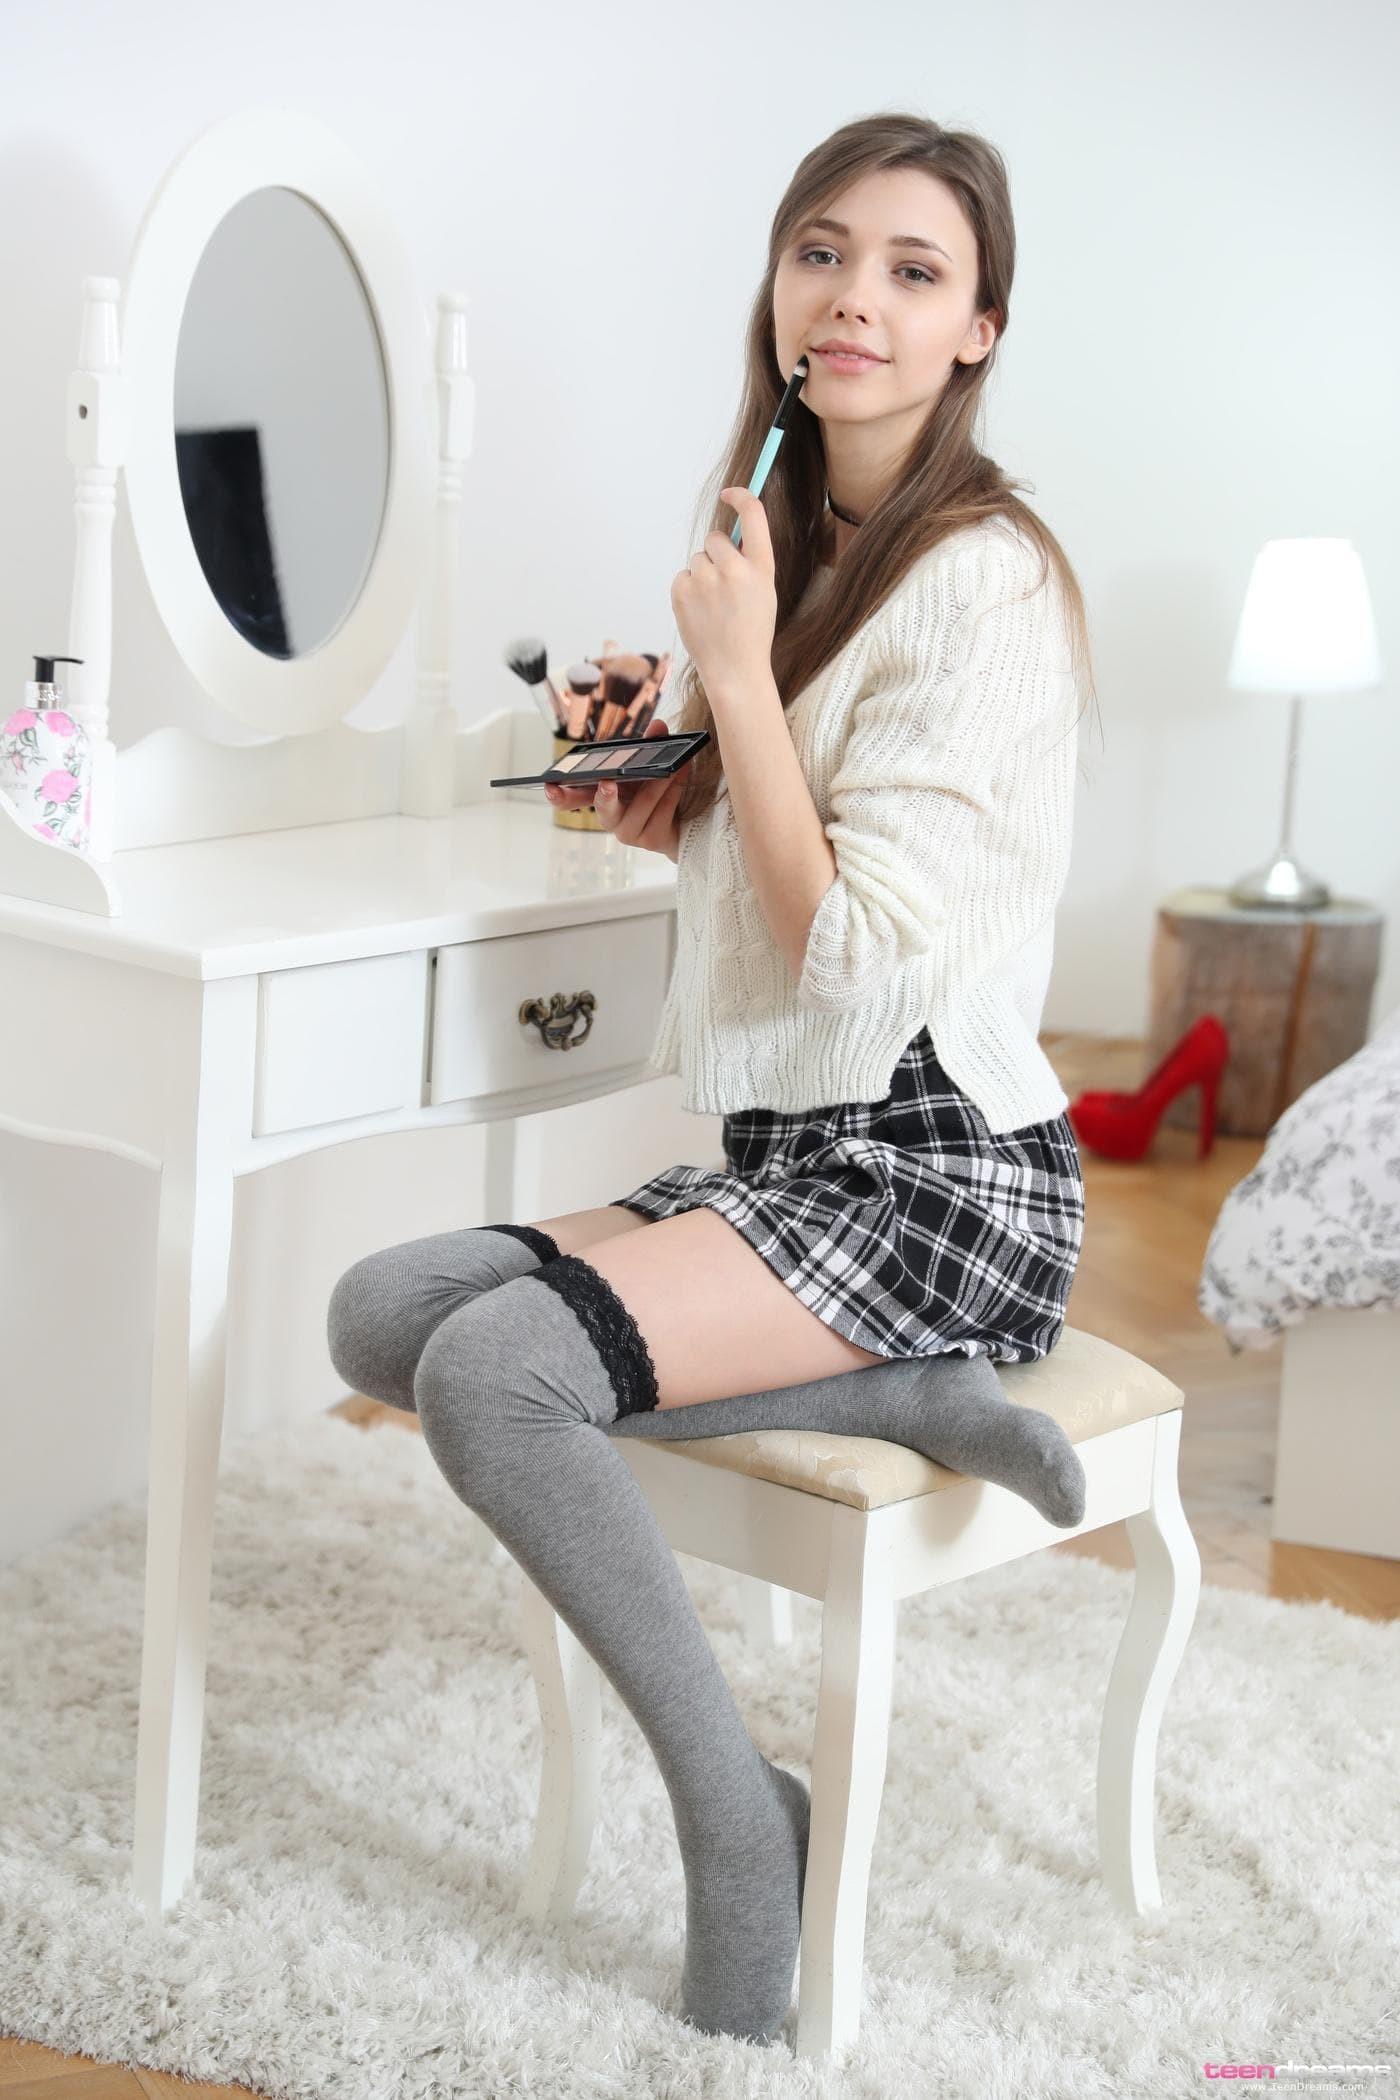 Студентка снимает короткую юбку и трусики - фото